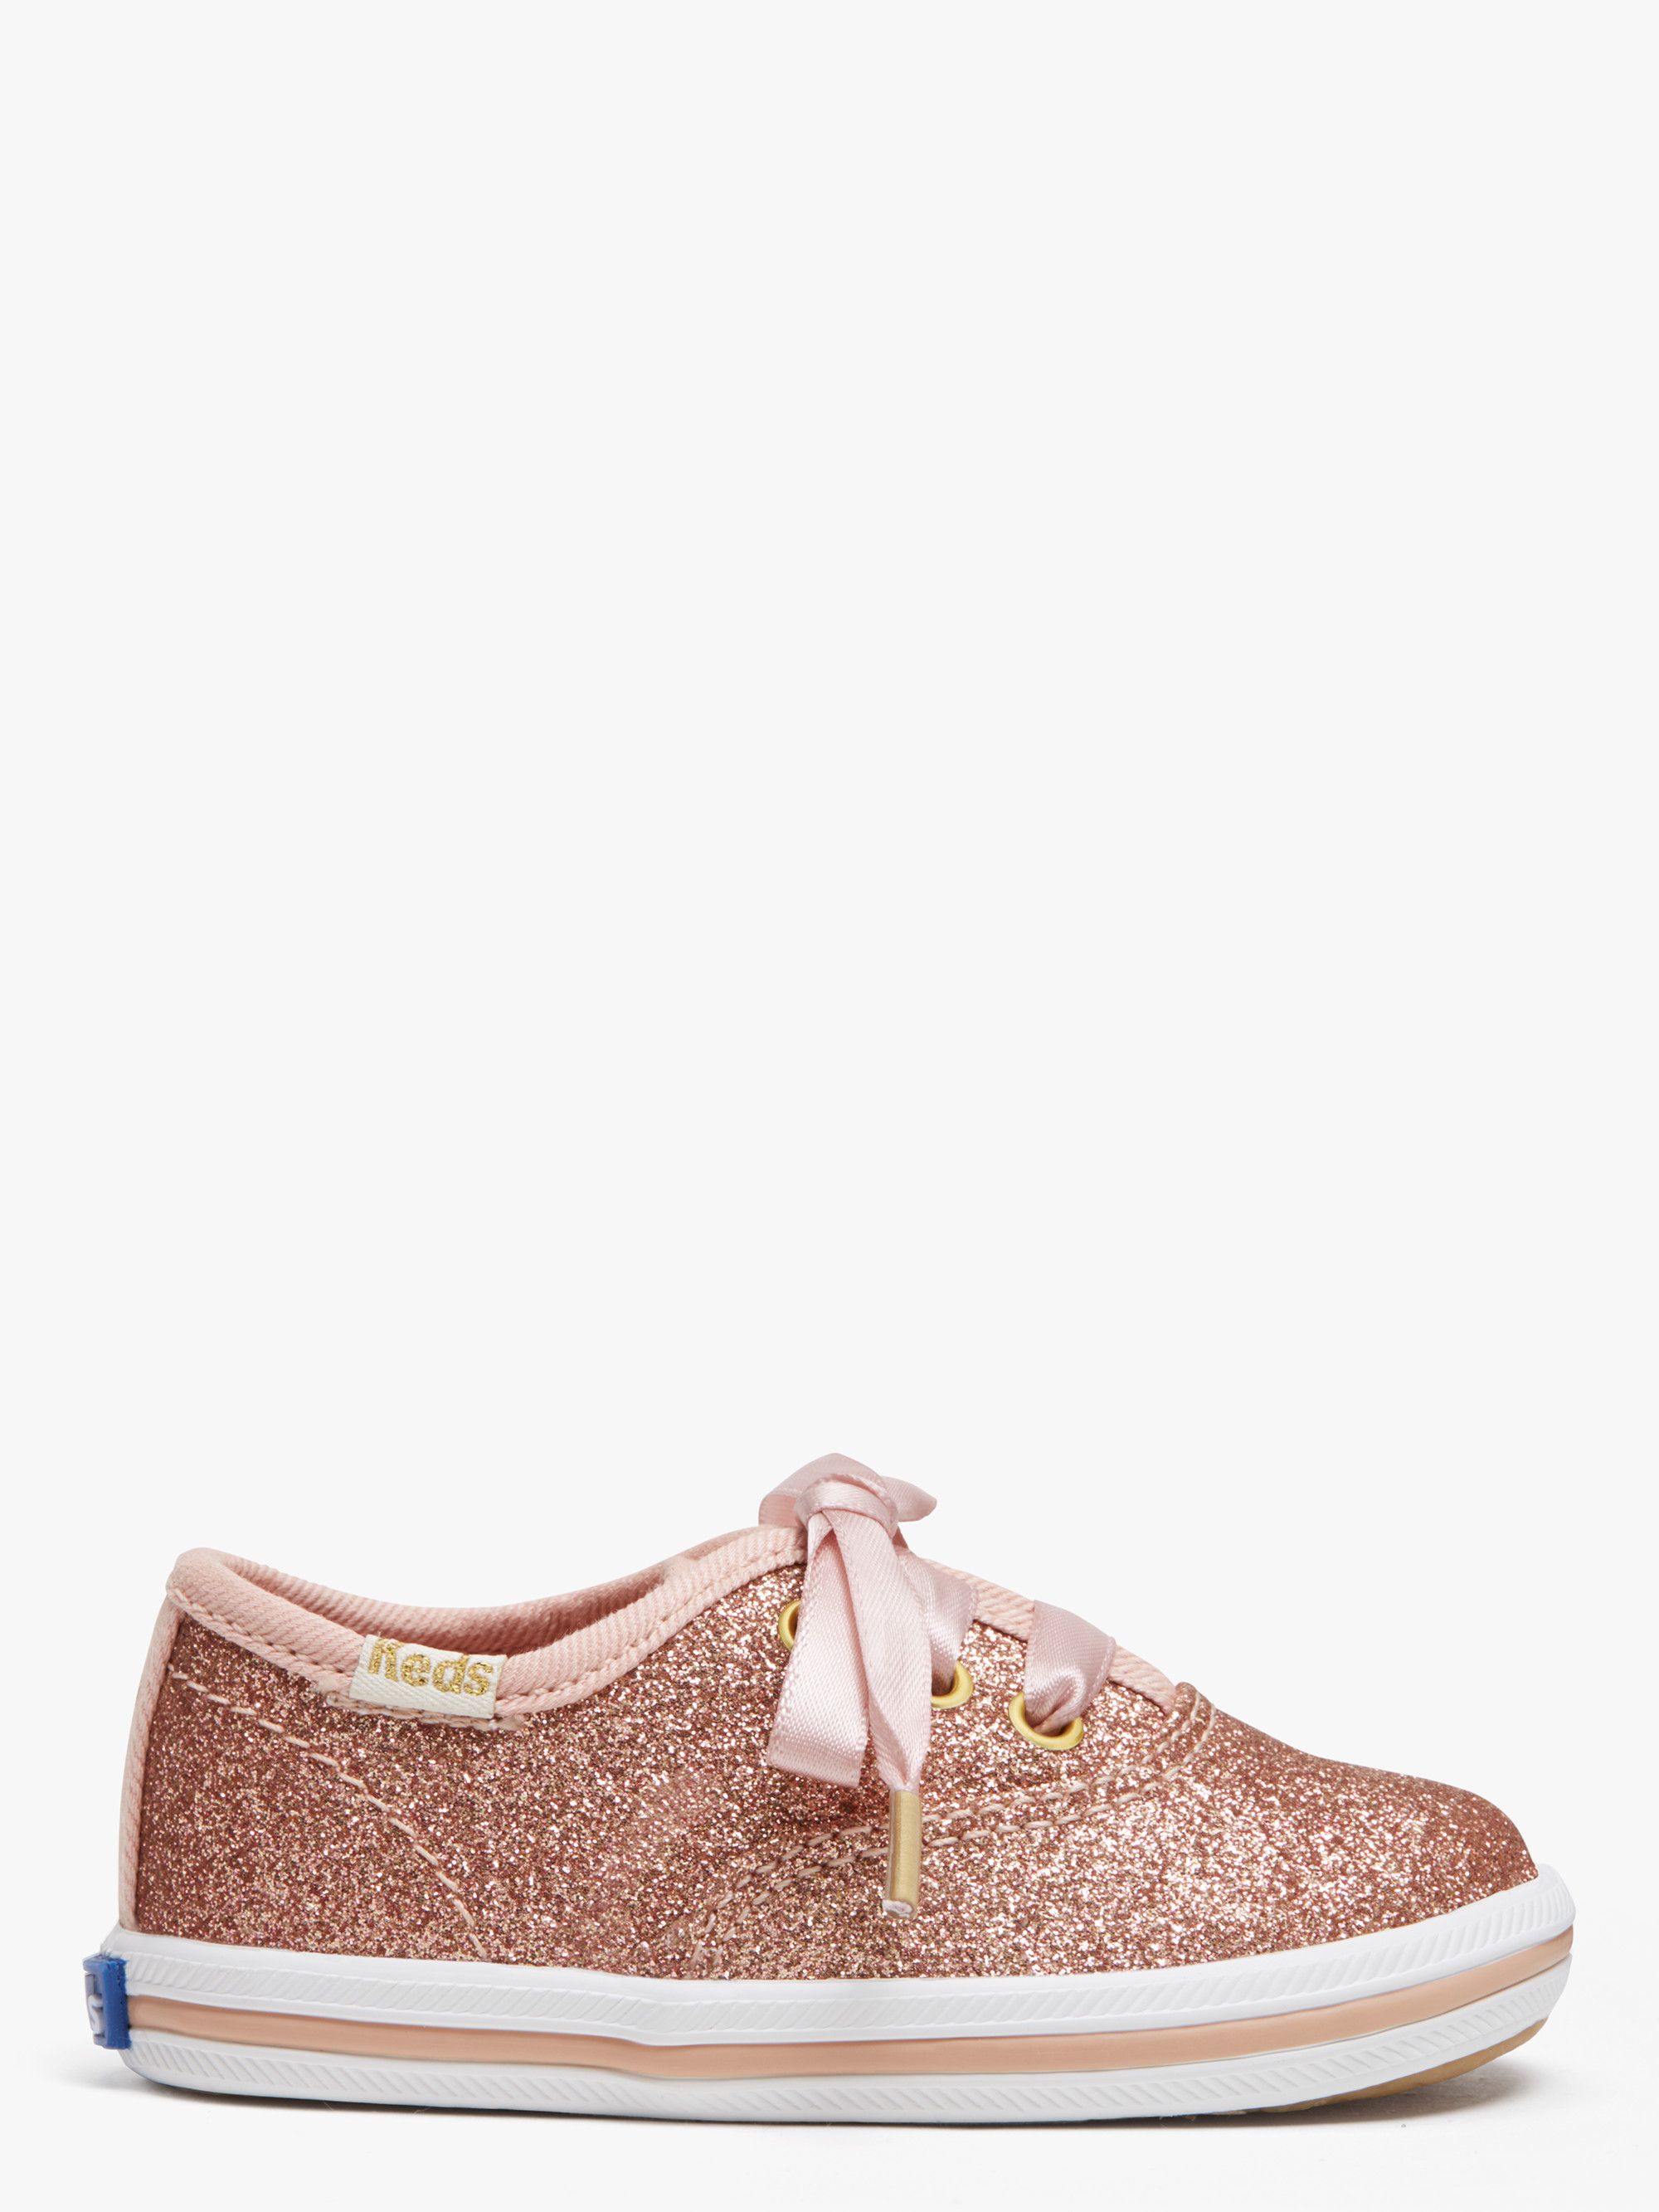 keds kids x kate spade new york champion glitter crib sneakers